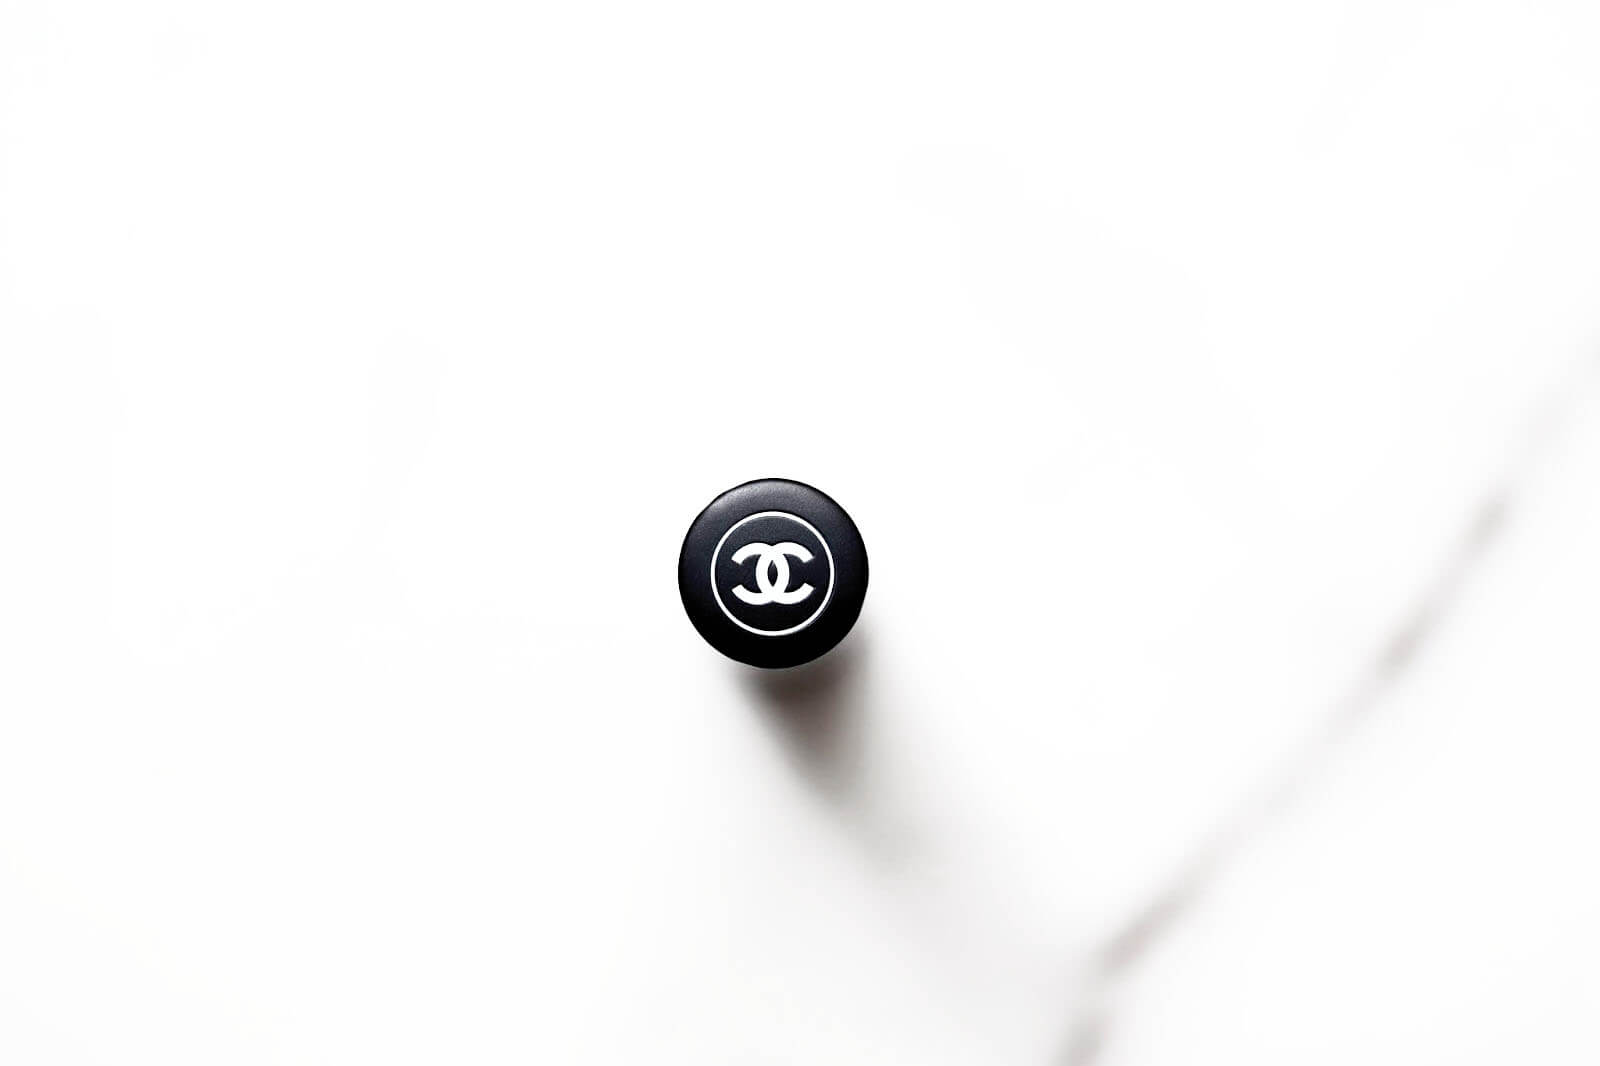 Chanel Mascara Le Volume Stretch avis